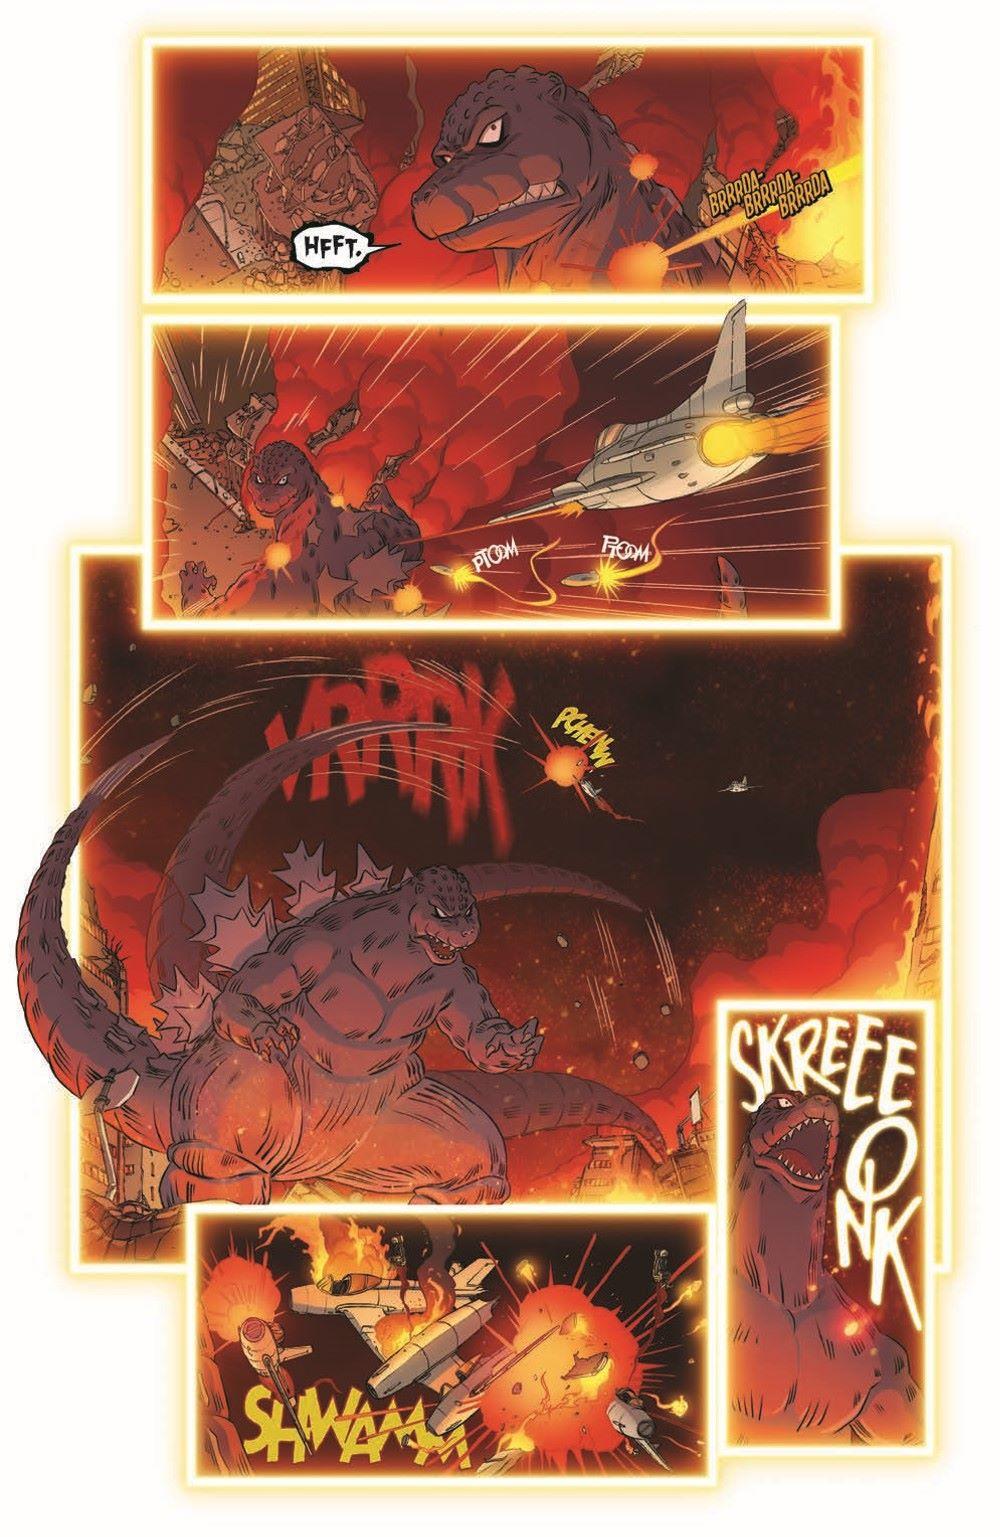 Godzilla_MnP_02_pr-7 ComicList Previews: GODZILLA MONSTERS AND PROTECTORS #2 (OF 5)